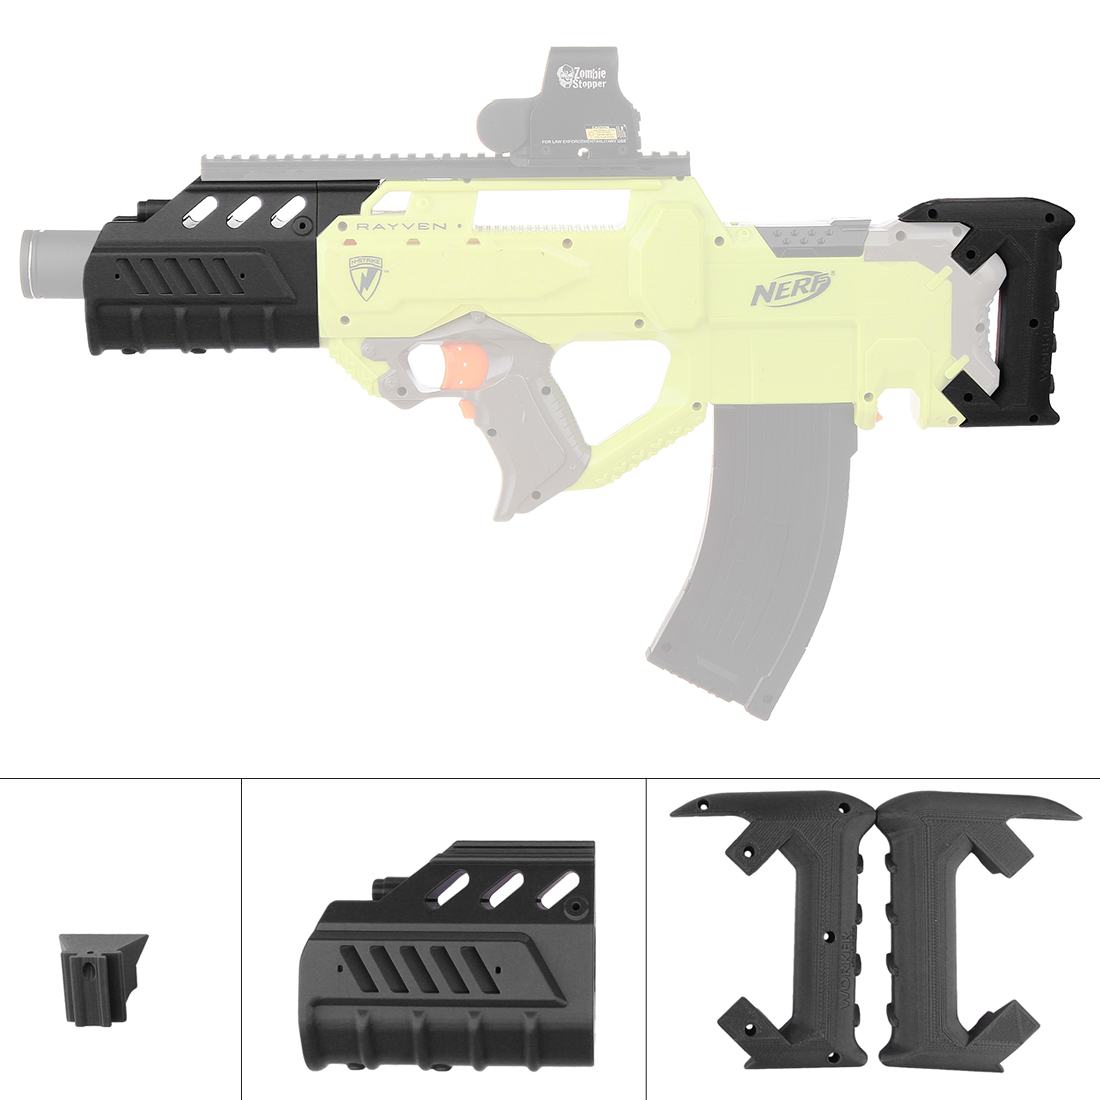 TRAVAILLEUR f10555 No 200 Lumineux Barils Kit pour Nerf N-strike Rayven CS-18 Blaster